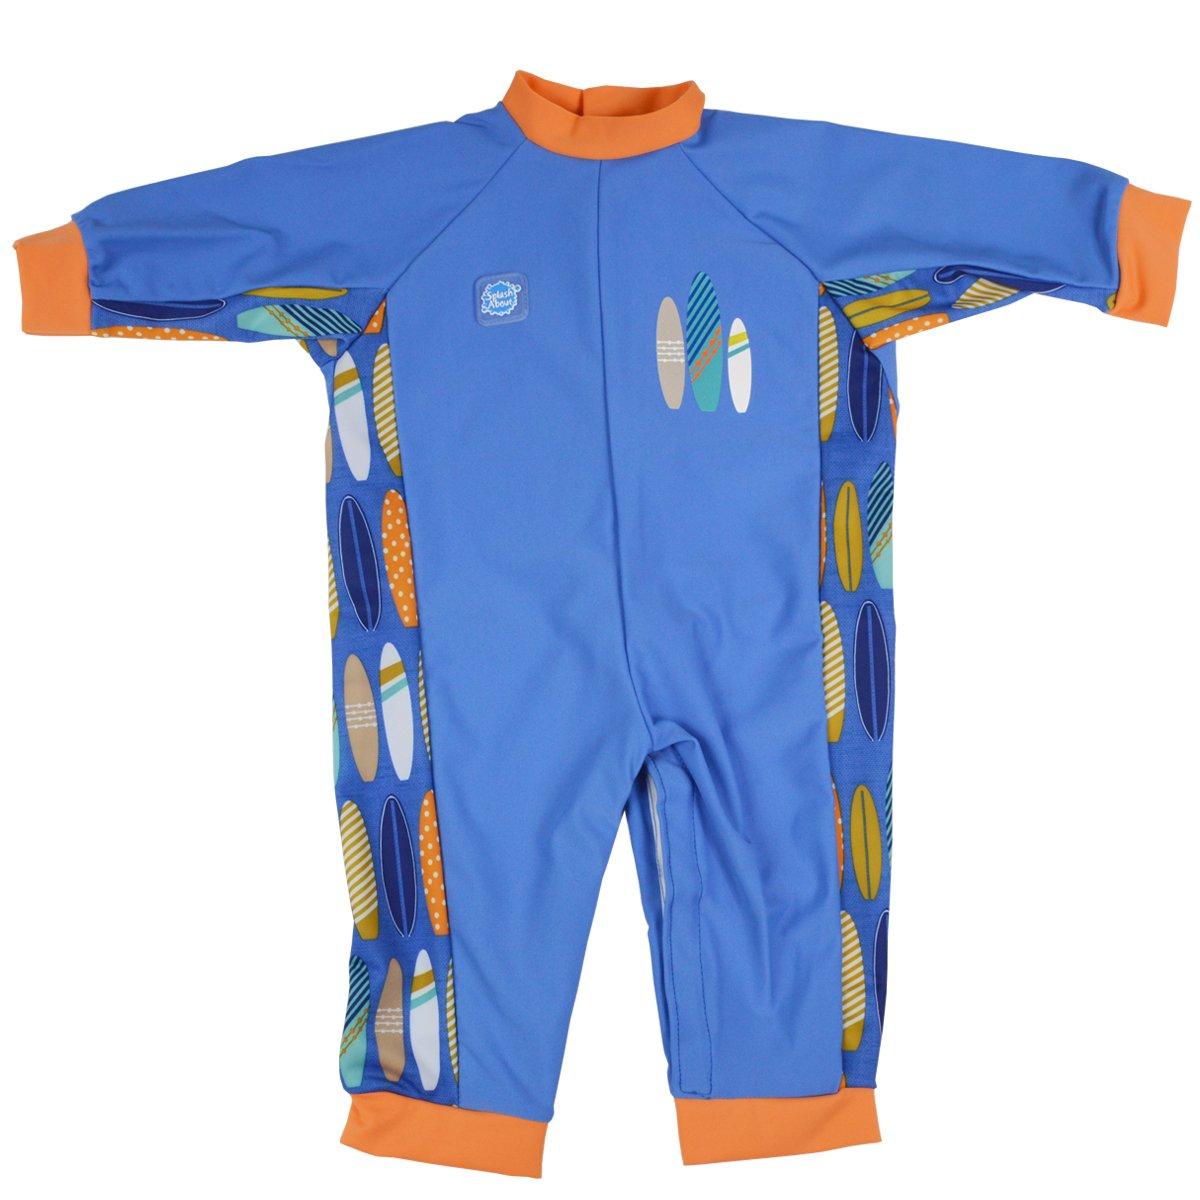 Splash About Children's UV All in One Eczema Suit (Surfs Up, 0-3 Months)